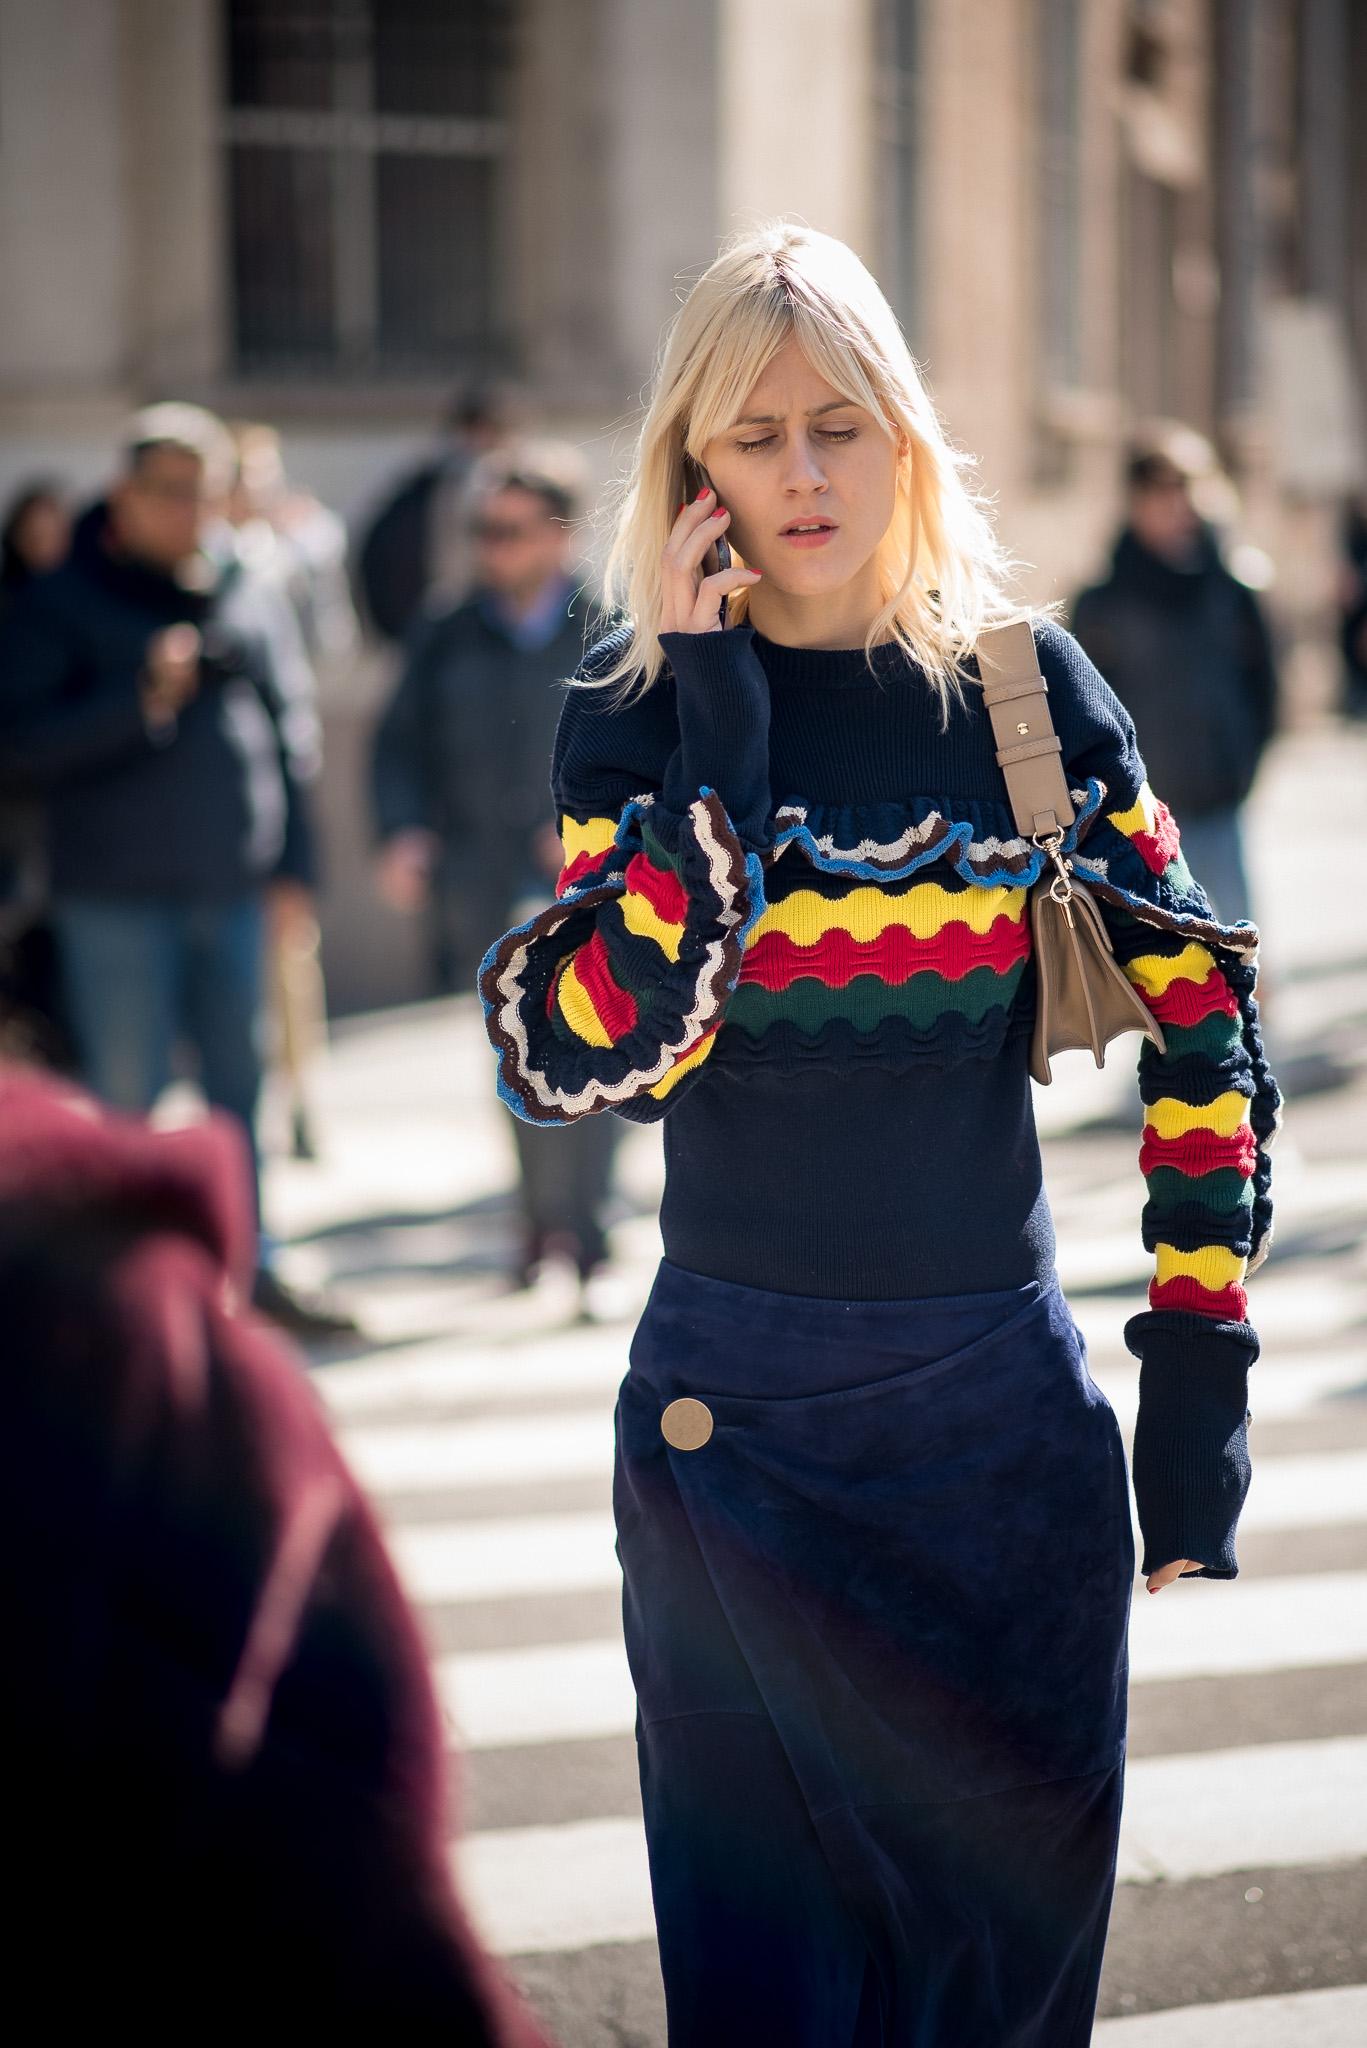 Linda Tol_Street Style Moments_Trussardi_Milan Fashion Week_February 26th 2017_Photography Annika Lagerqvist_www.annikasomething.com